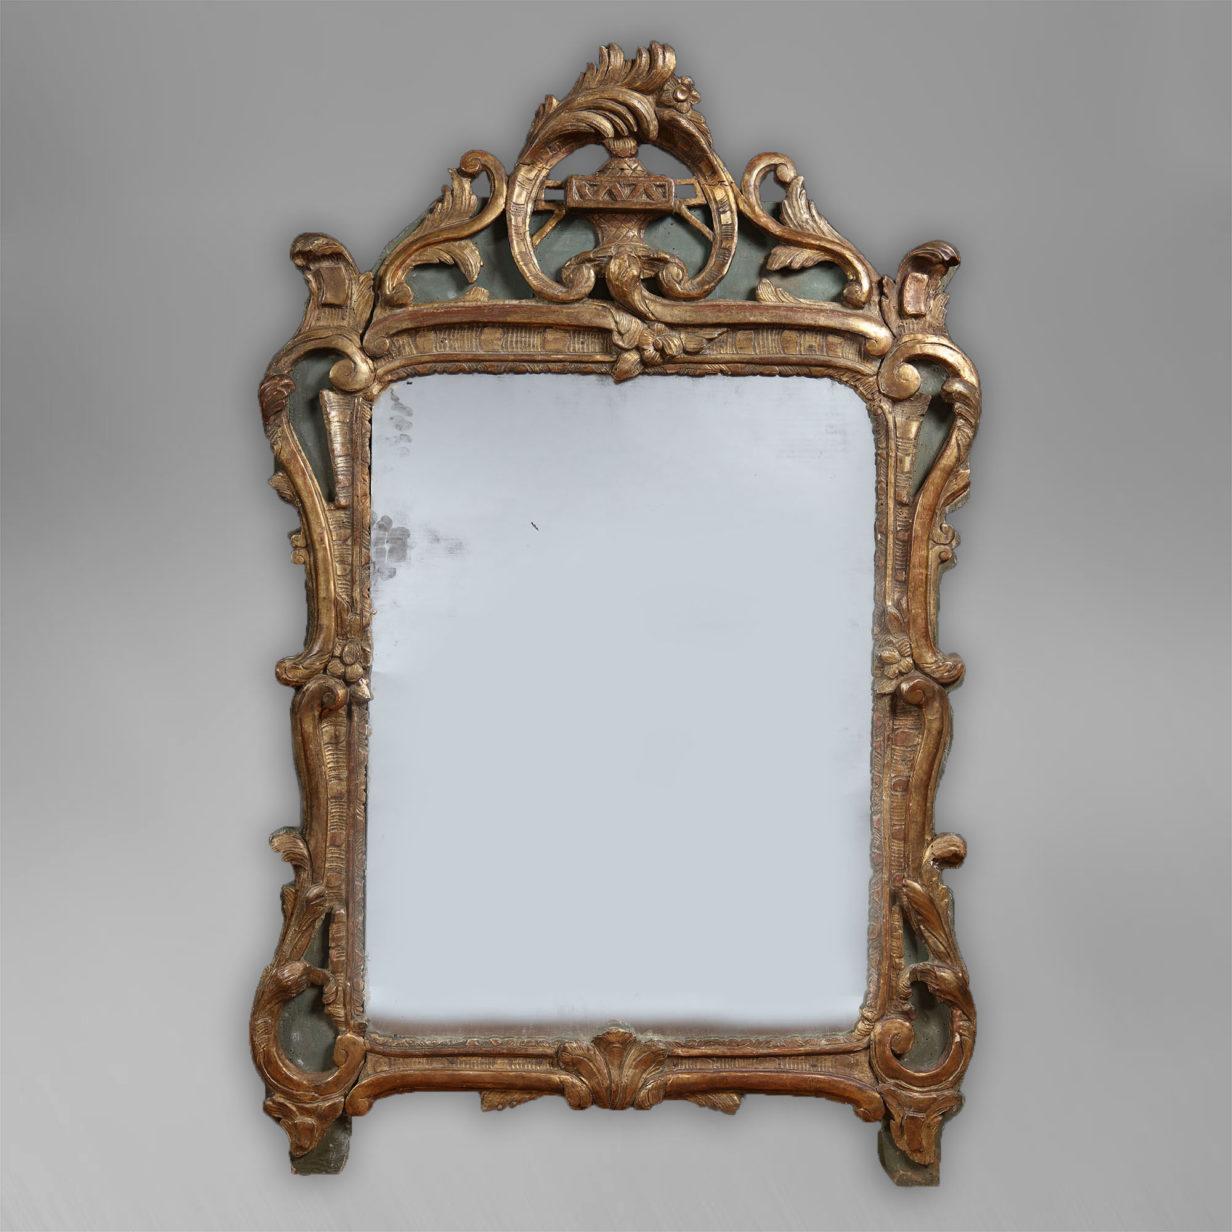 Louis XV Period Parcel Gilt Mirror